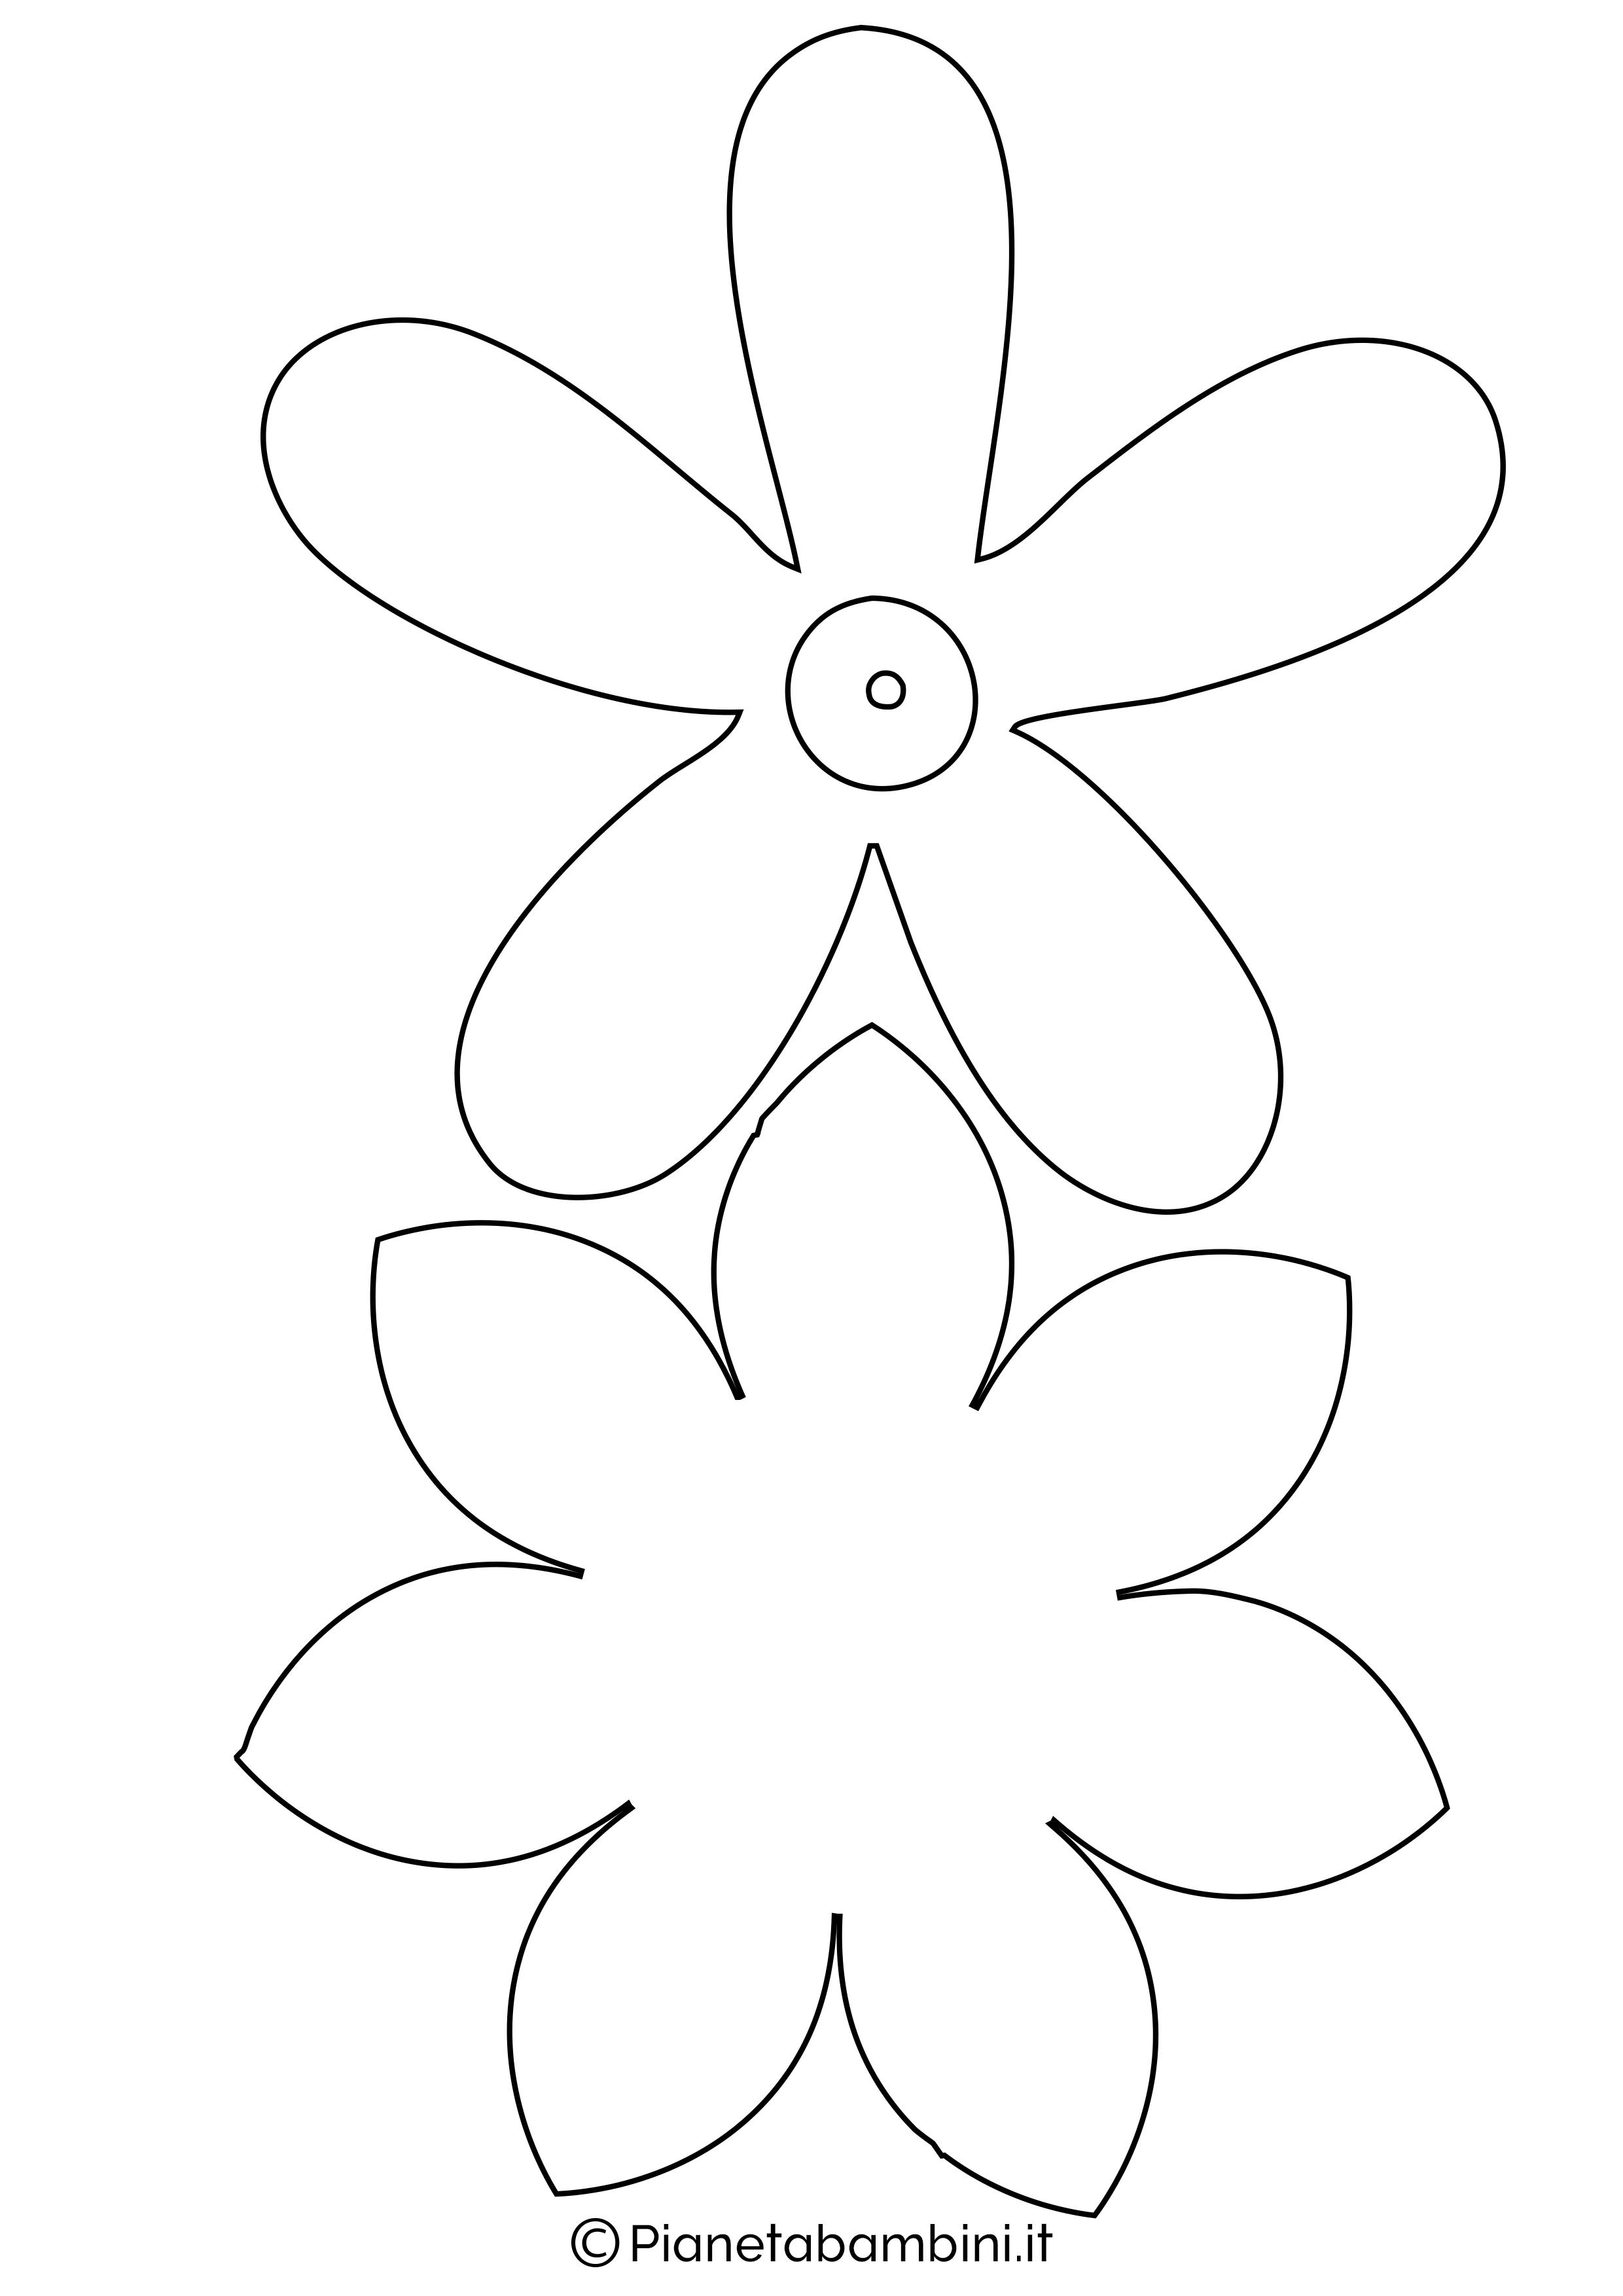 Sagome fiori medie da stampare 8